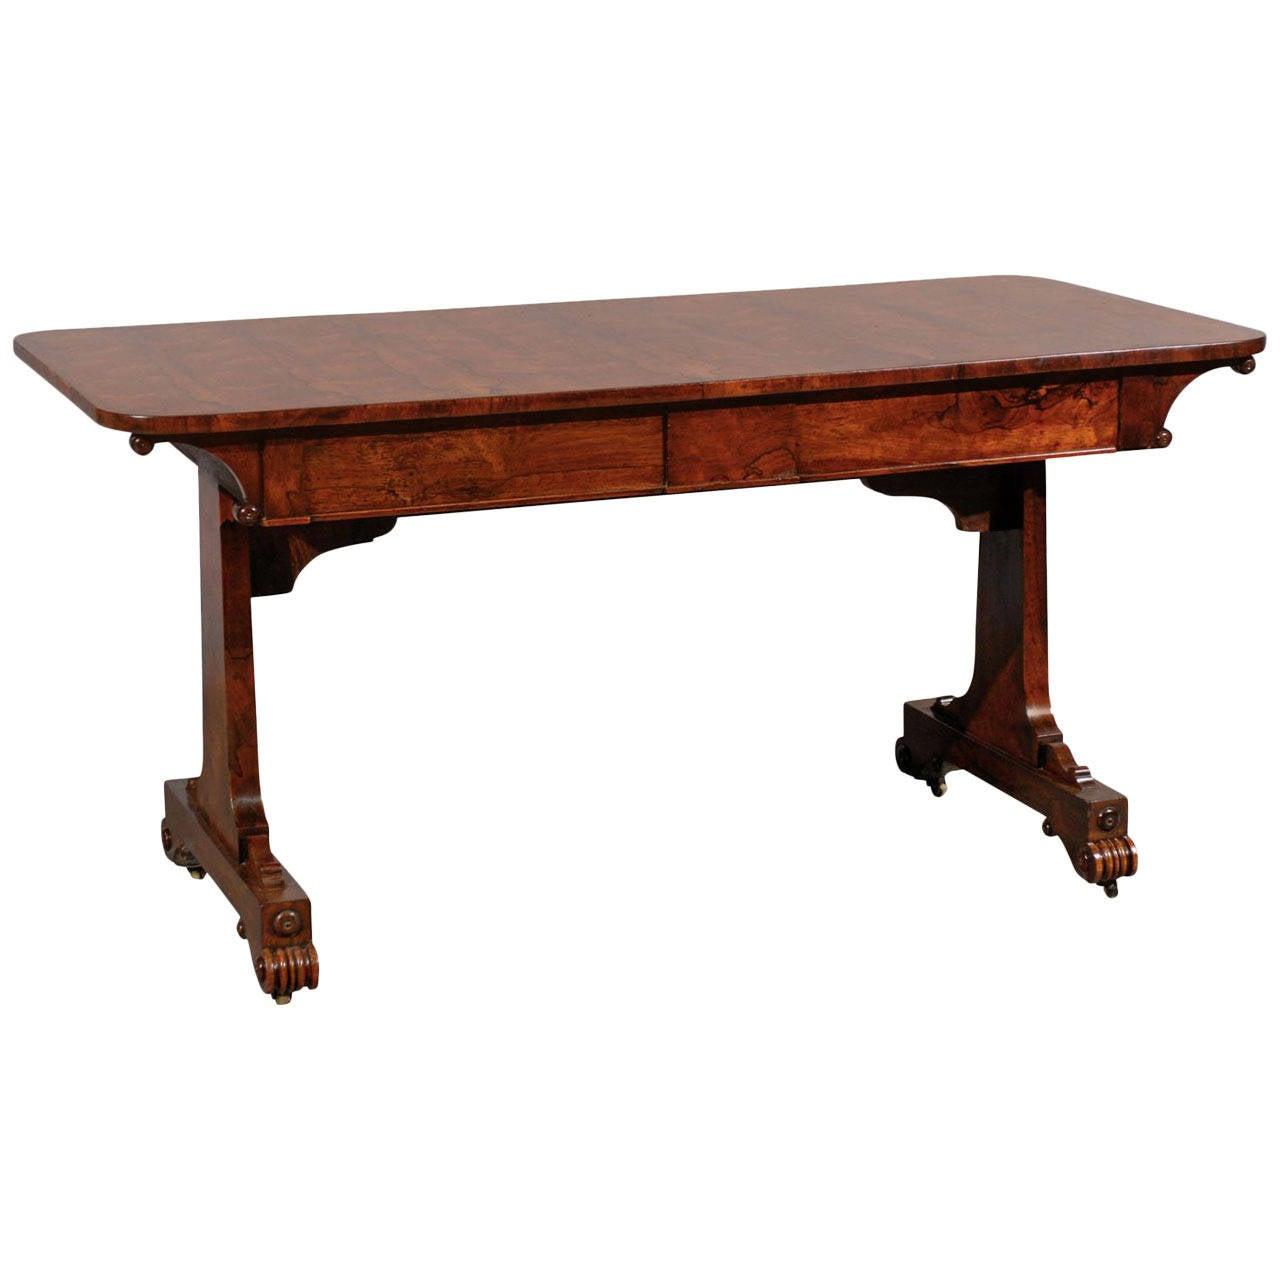 19th Century English Rosewood Sofa or Writing Table